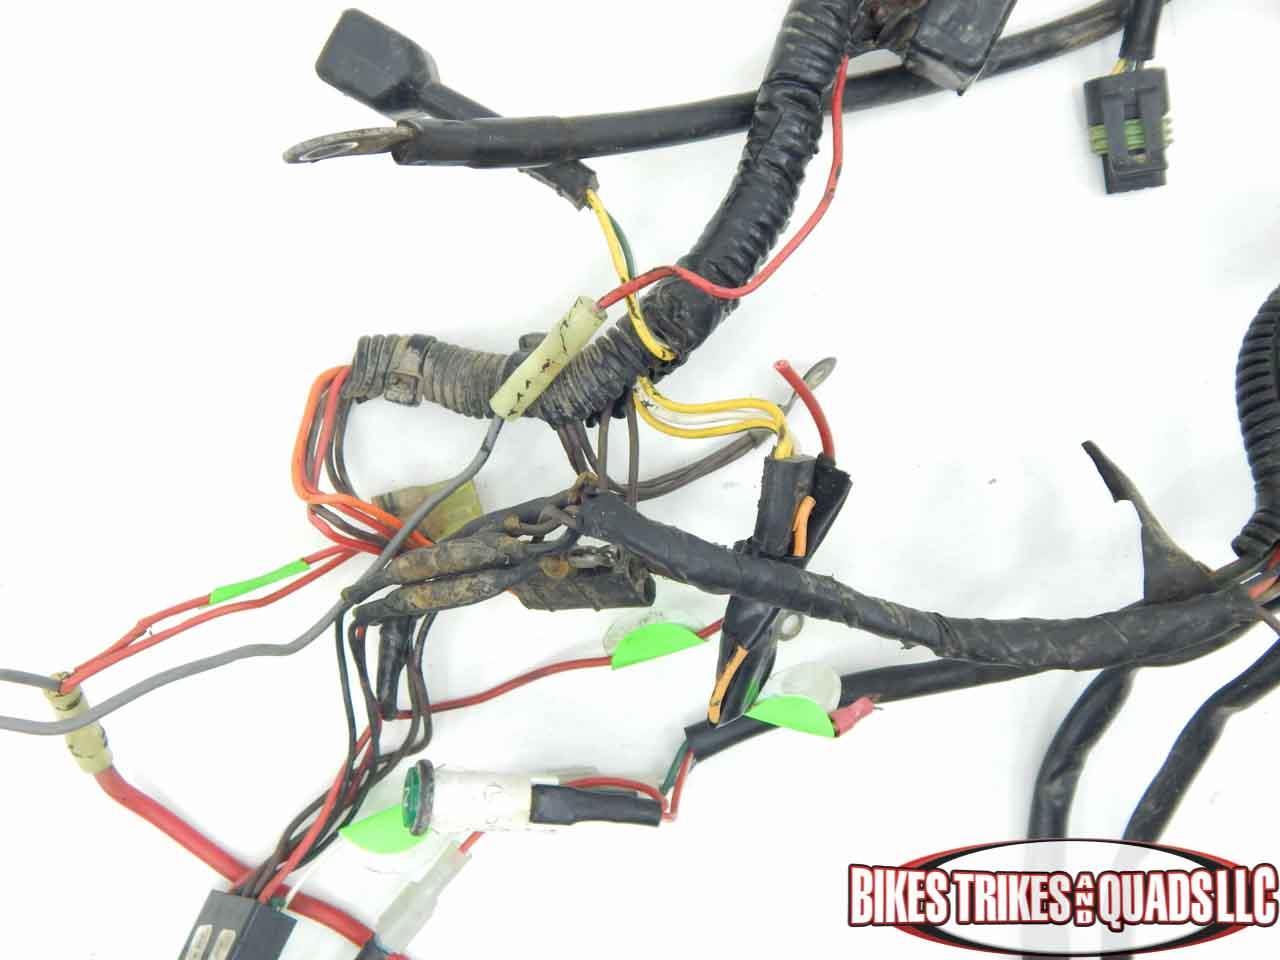 polaris predator 500 wiring harness. Black Bedroom Furniture Sets. Home Design Ideas